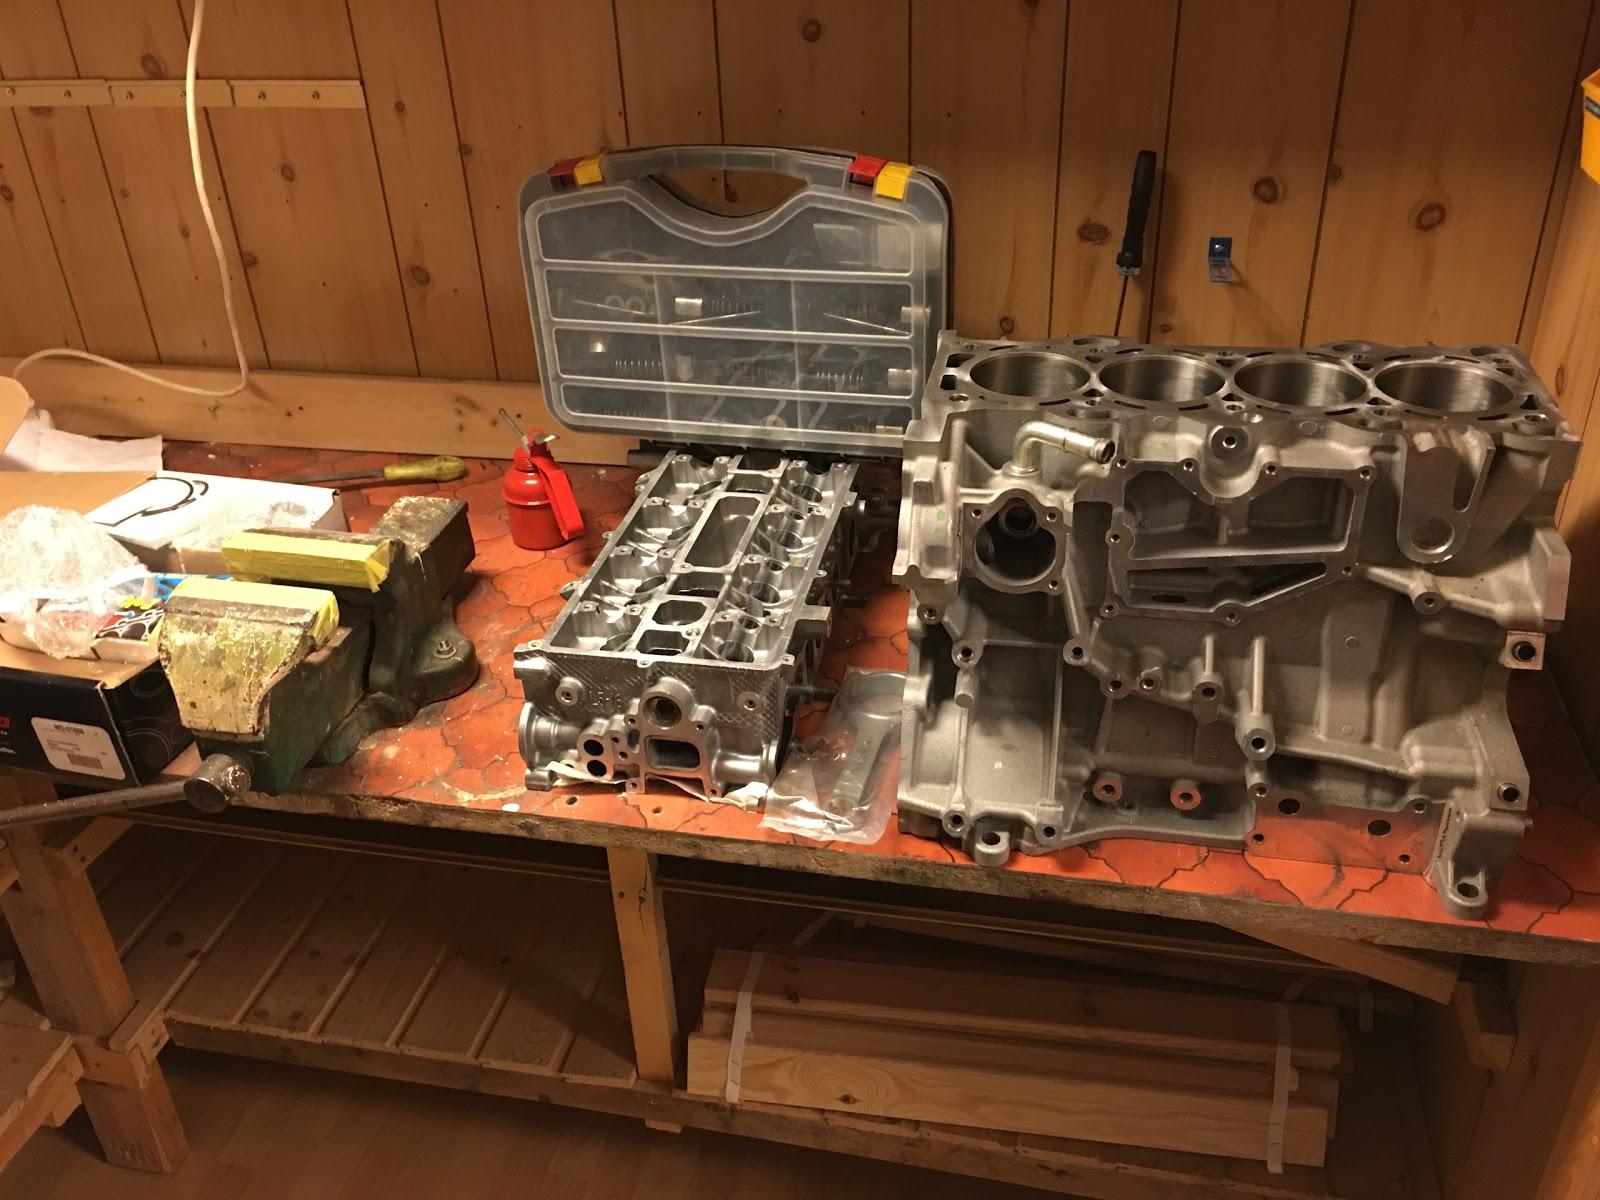 Engine rebuild part 4: Mazda MZR 2 5L valve job and assembly